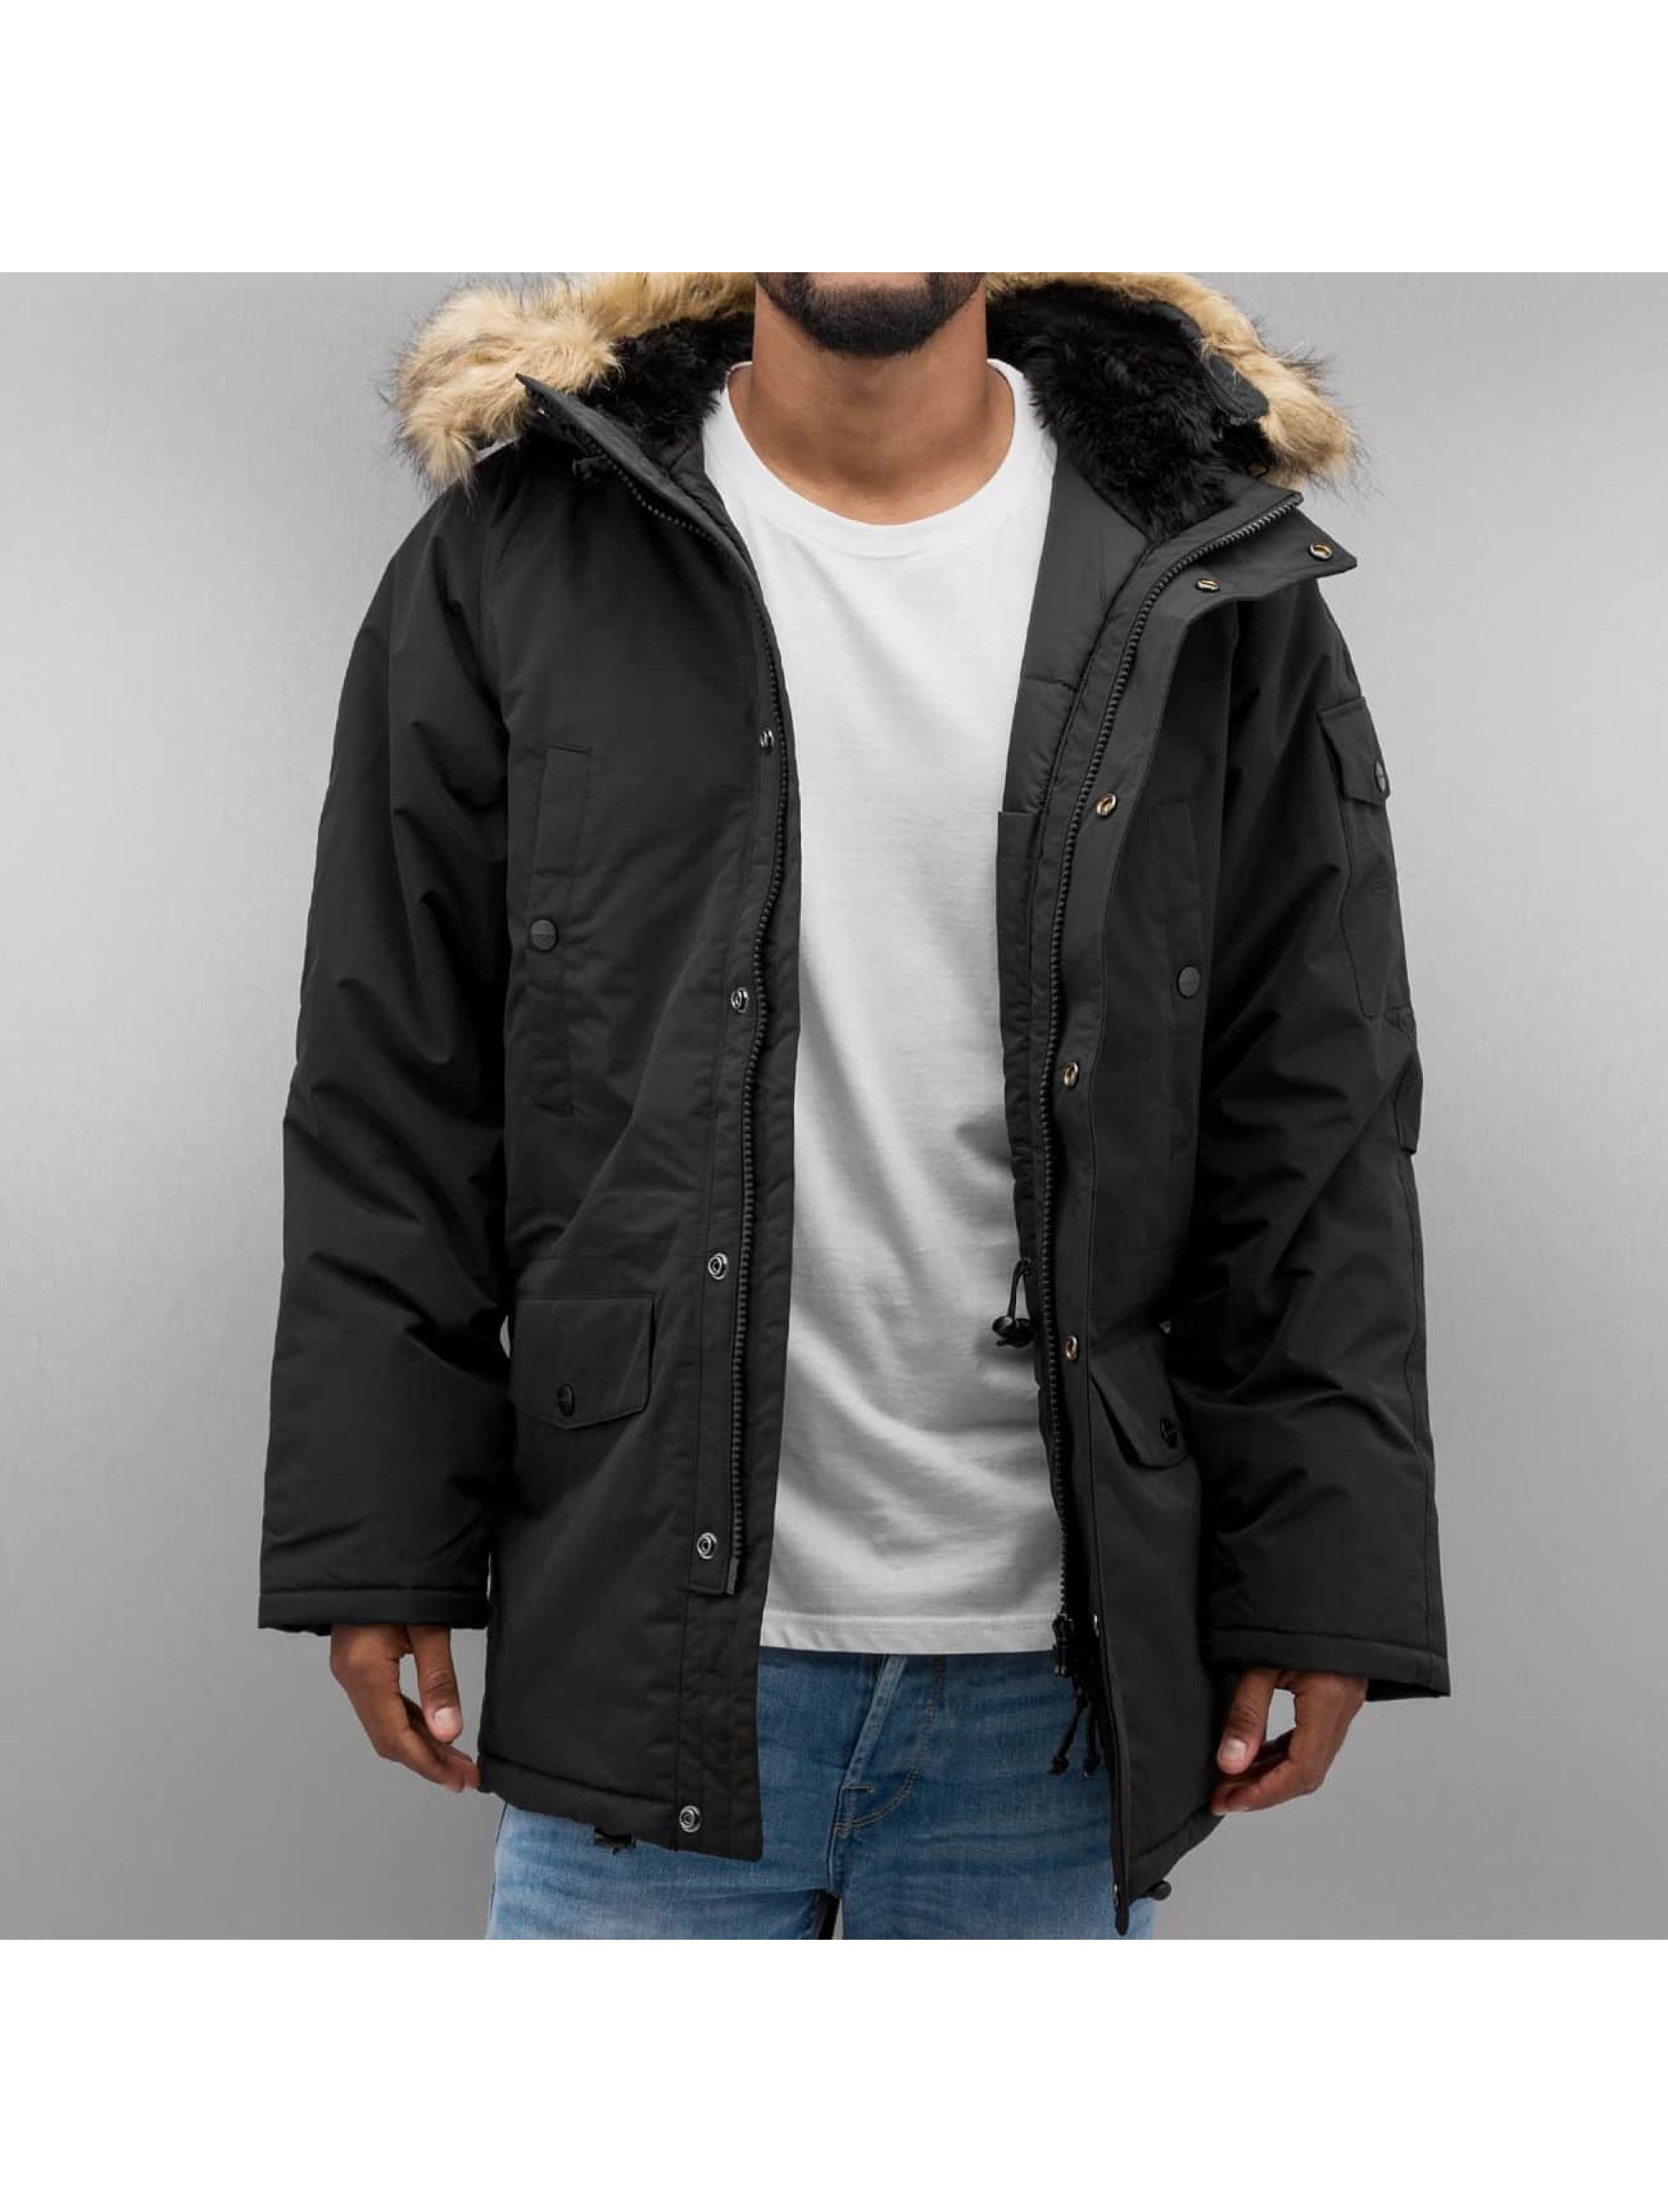 Carhartt WIP Winter Jacket Anchorage black